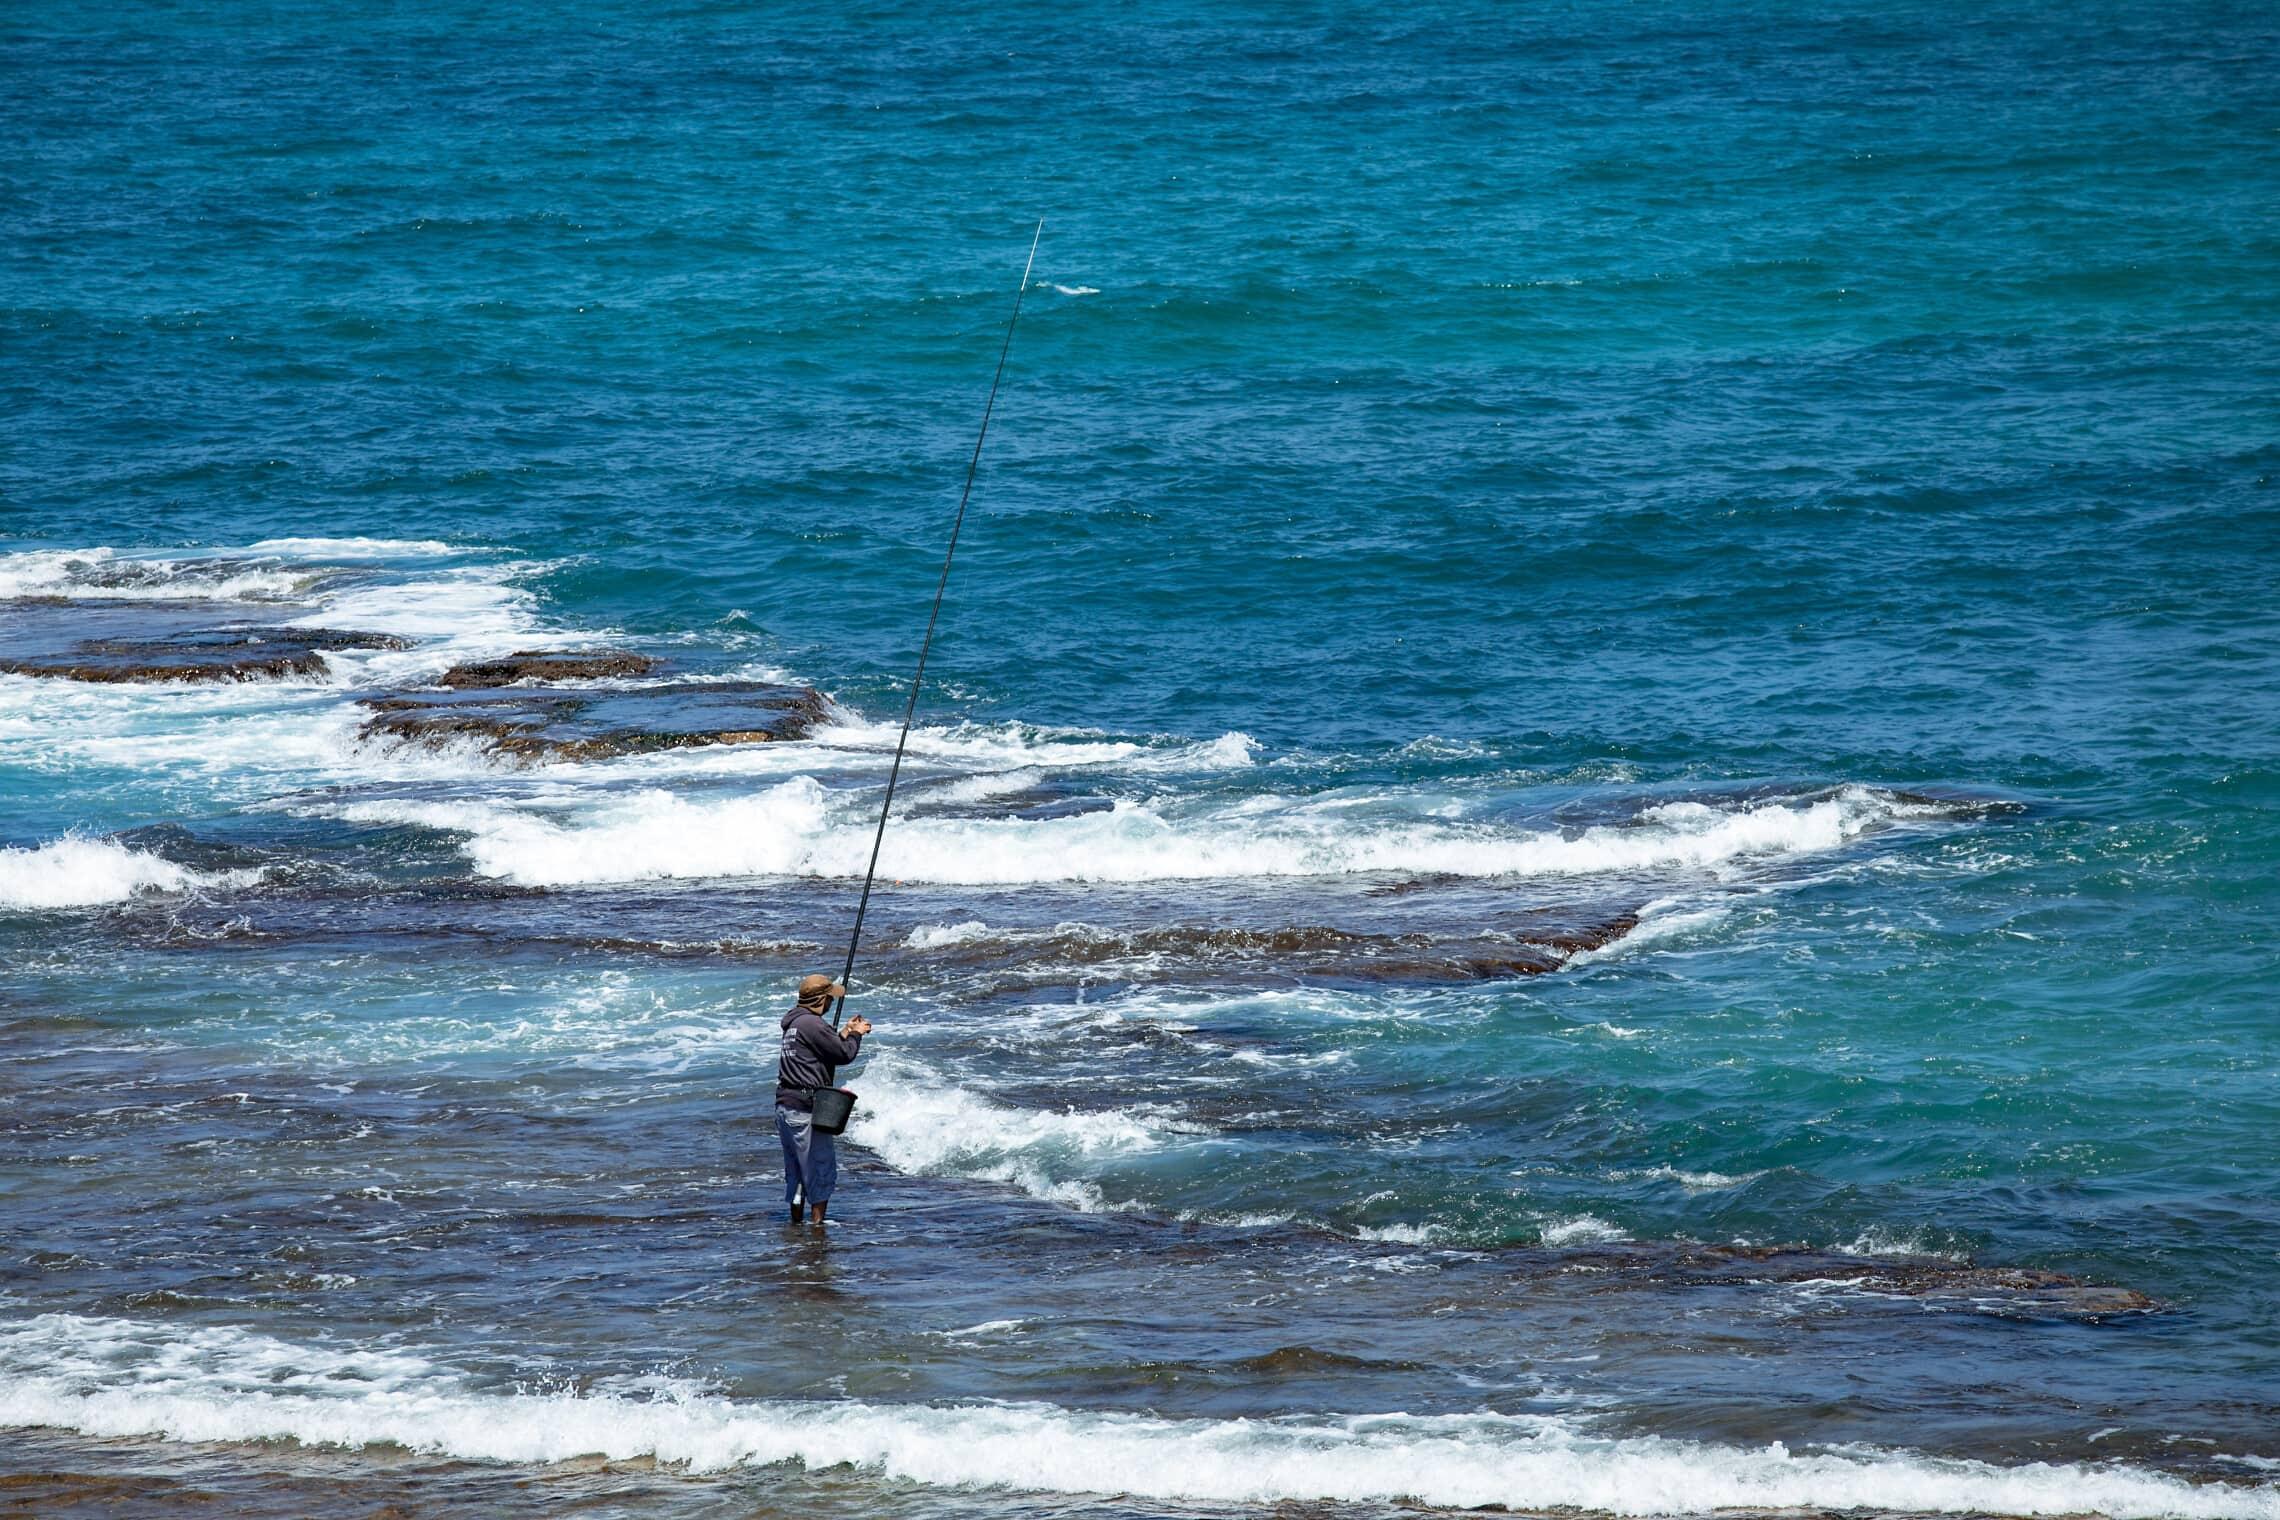 דייג בג'סר א-זרקא (ארכיון) (צילום: ענת חרמוני/פלאש90)